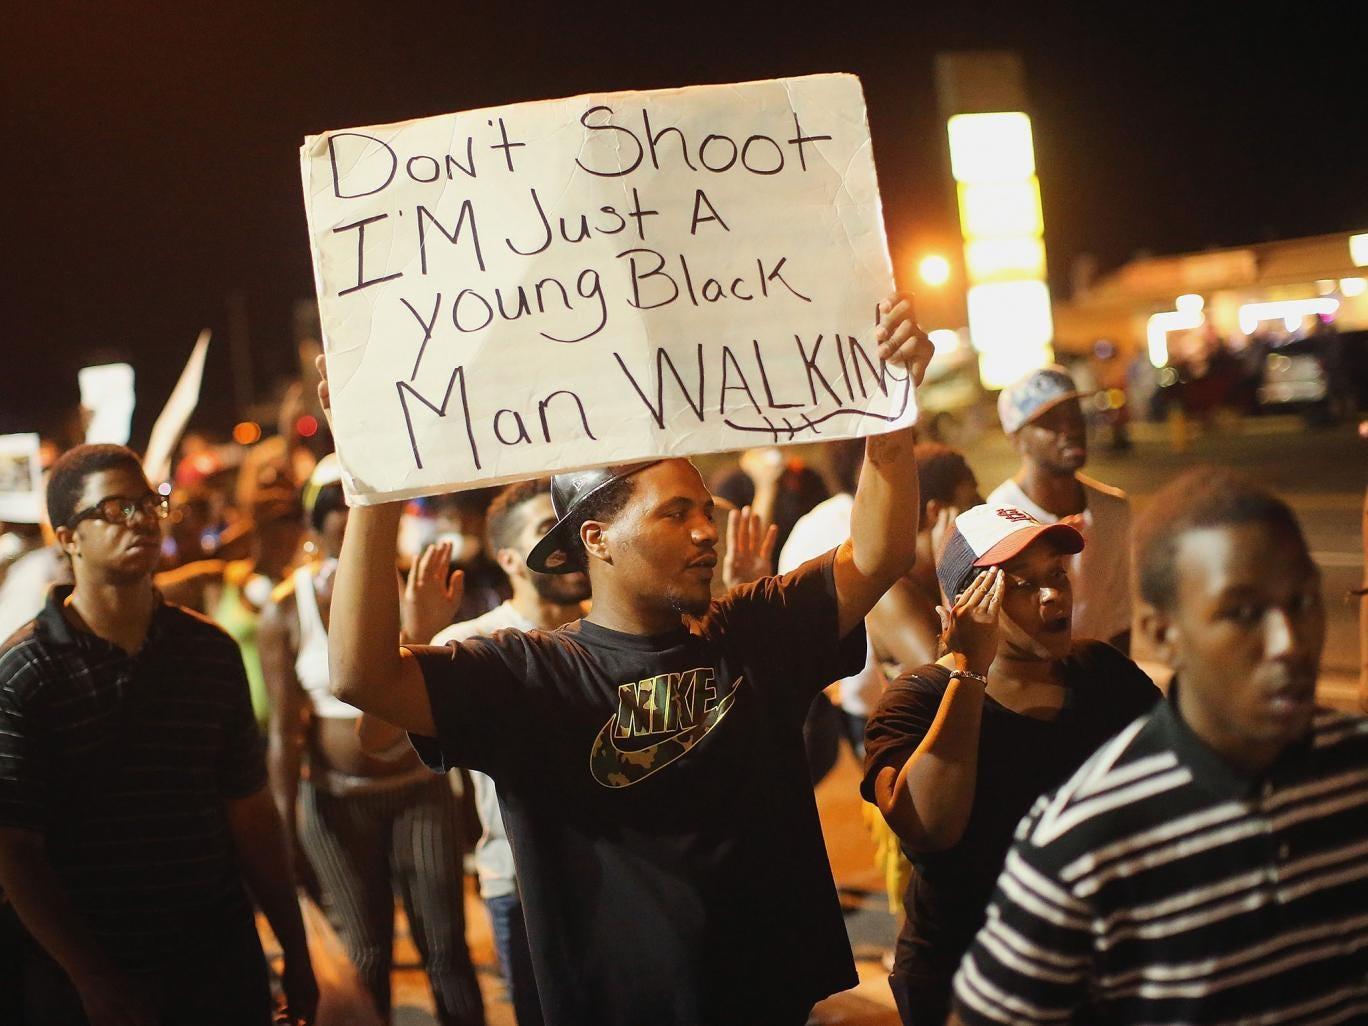 Demonstrators protest the killing of teenager Michael Brown on August 19, 2014 in Ferguson, Missouri.